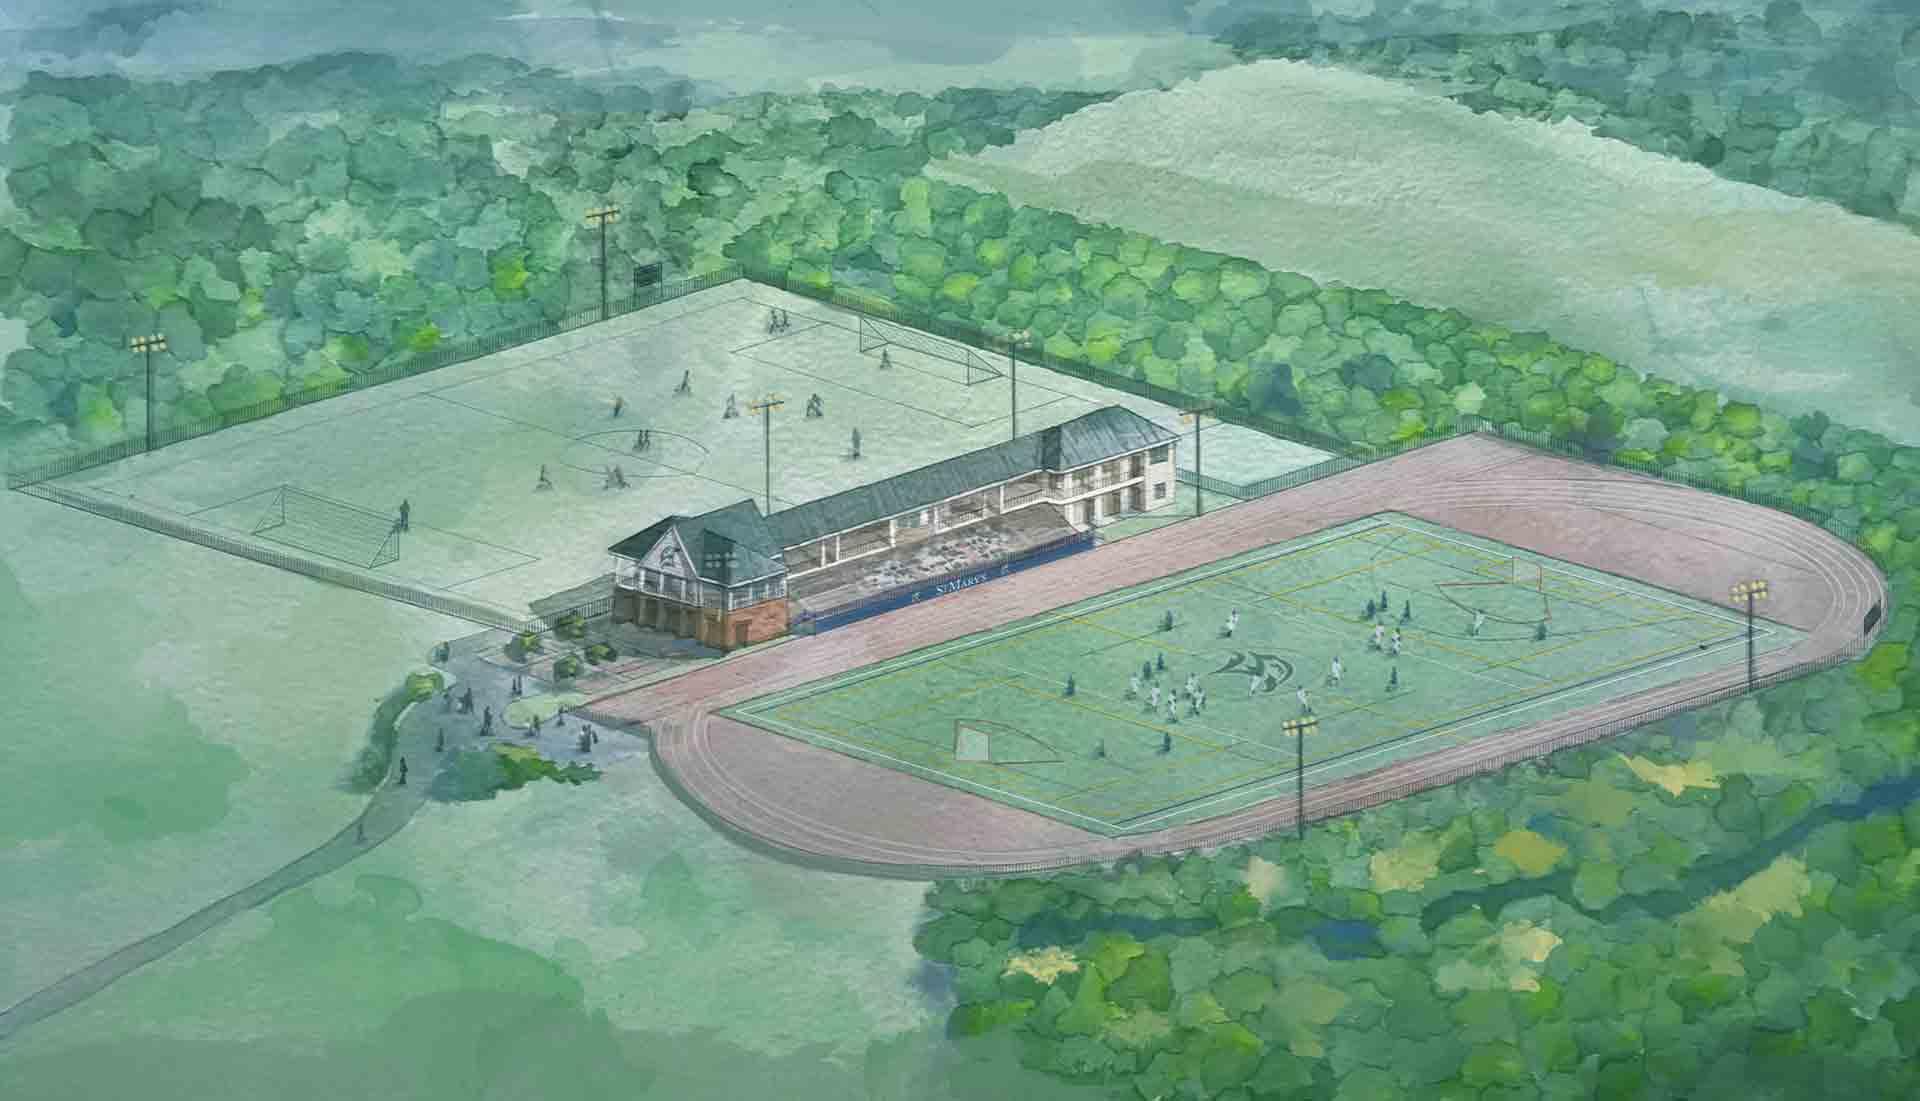 smcm-roberts-stadium-aerial-illustration-LOFI